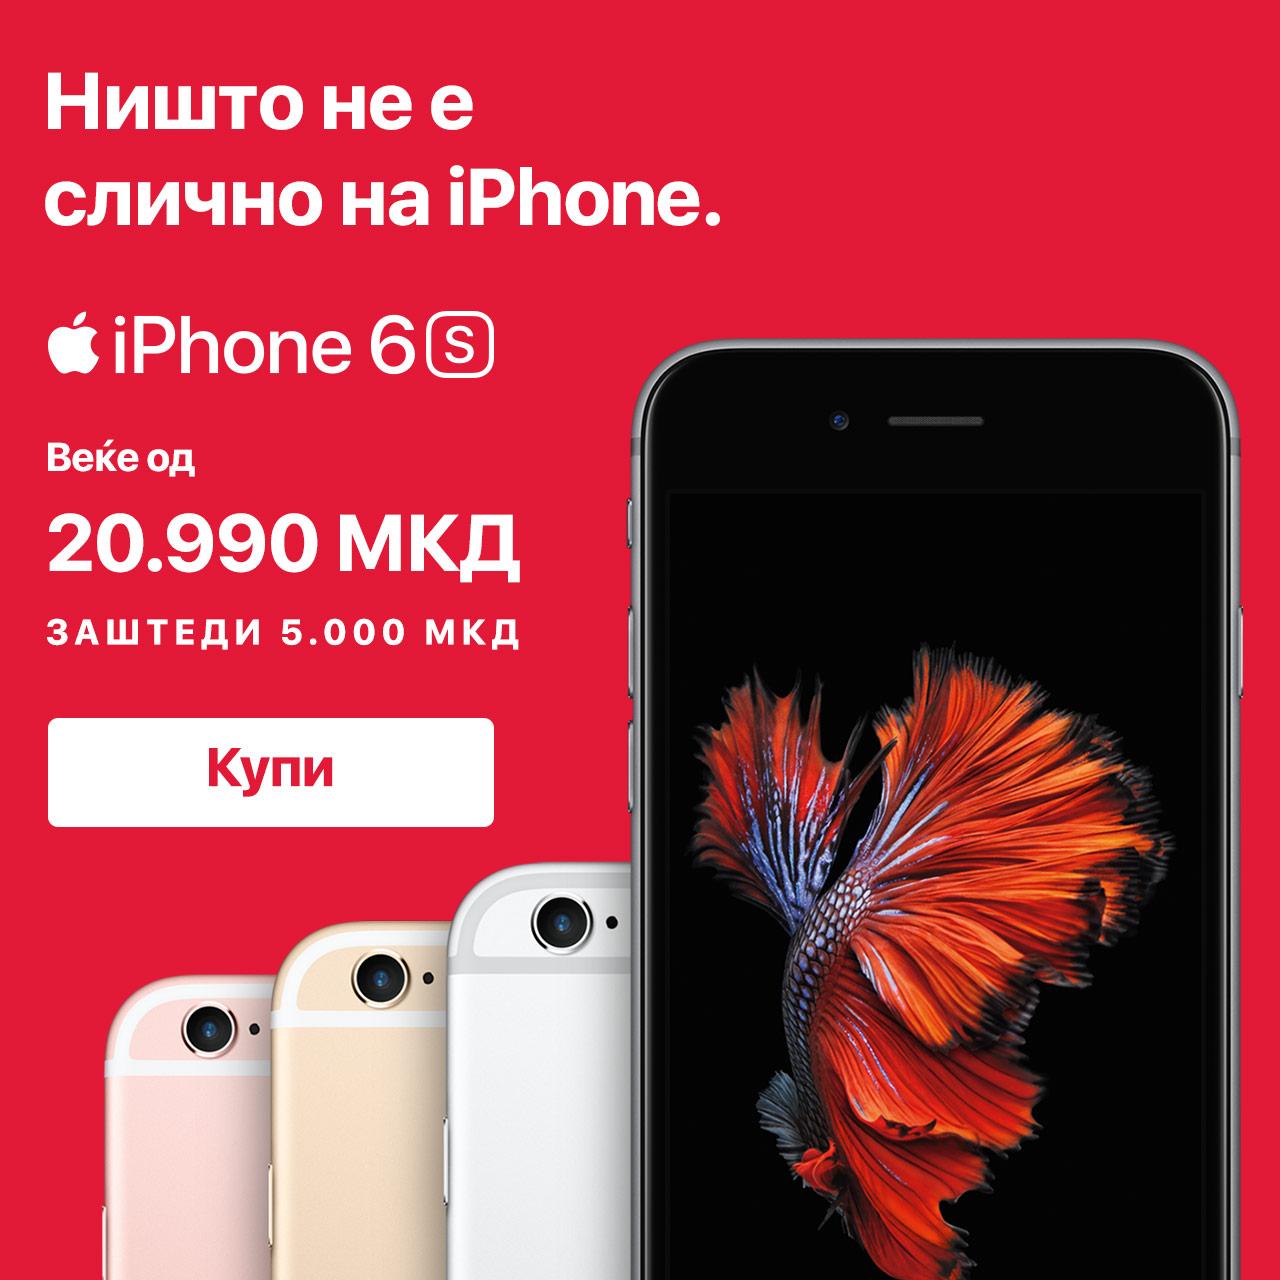 iPhone 6s - Promo